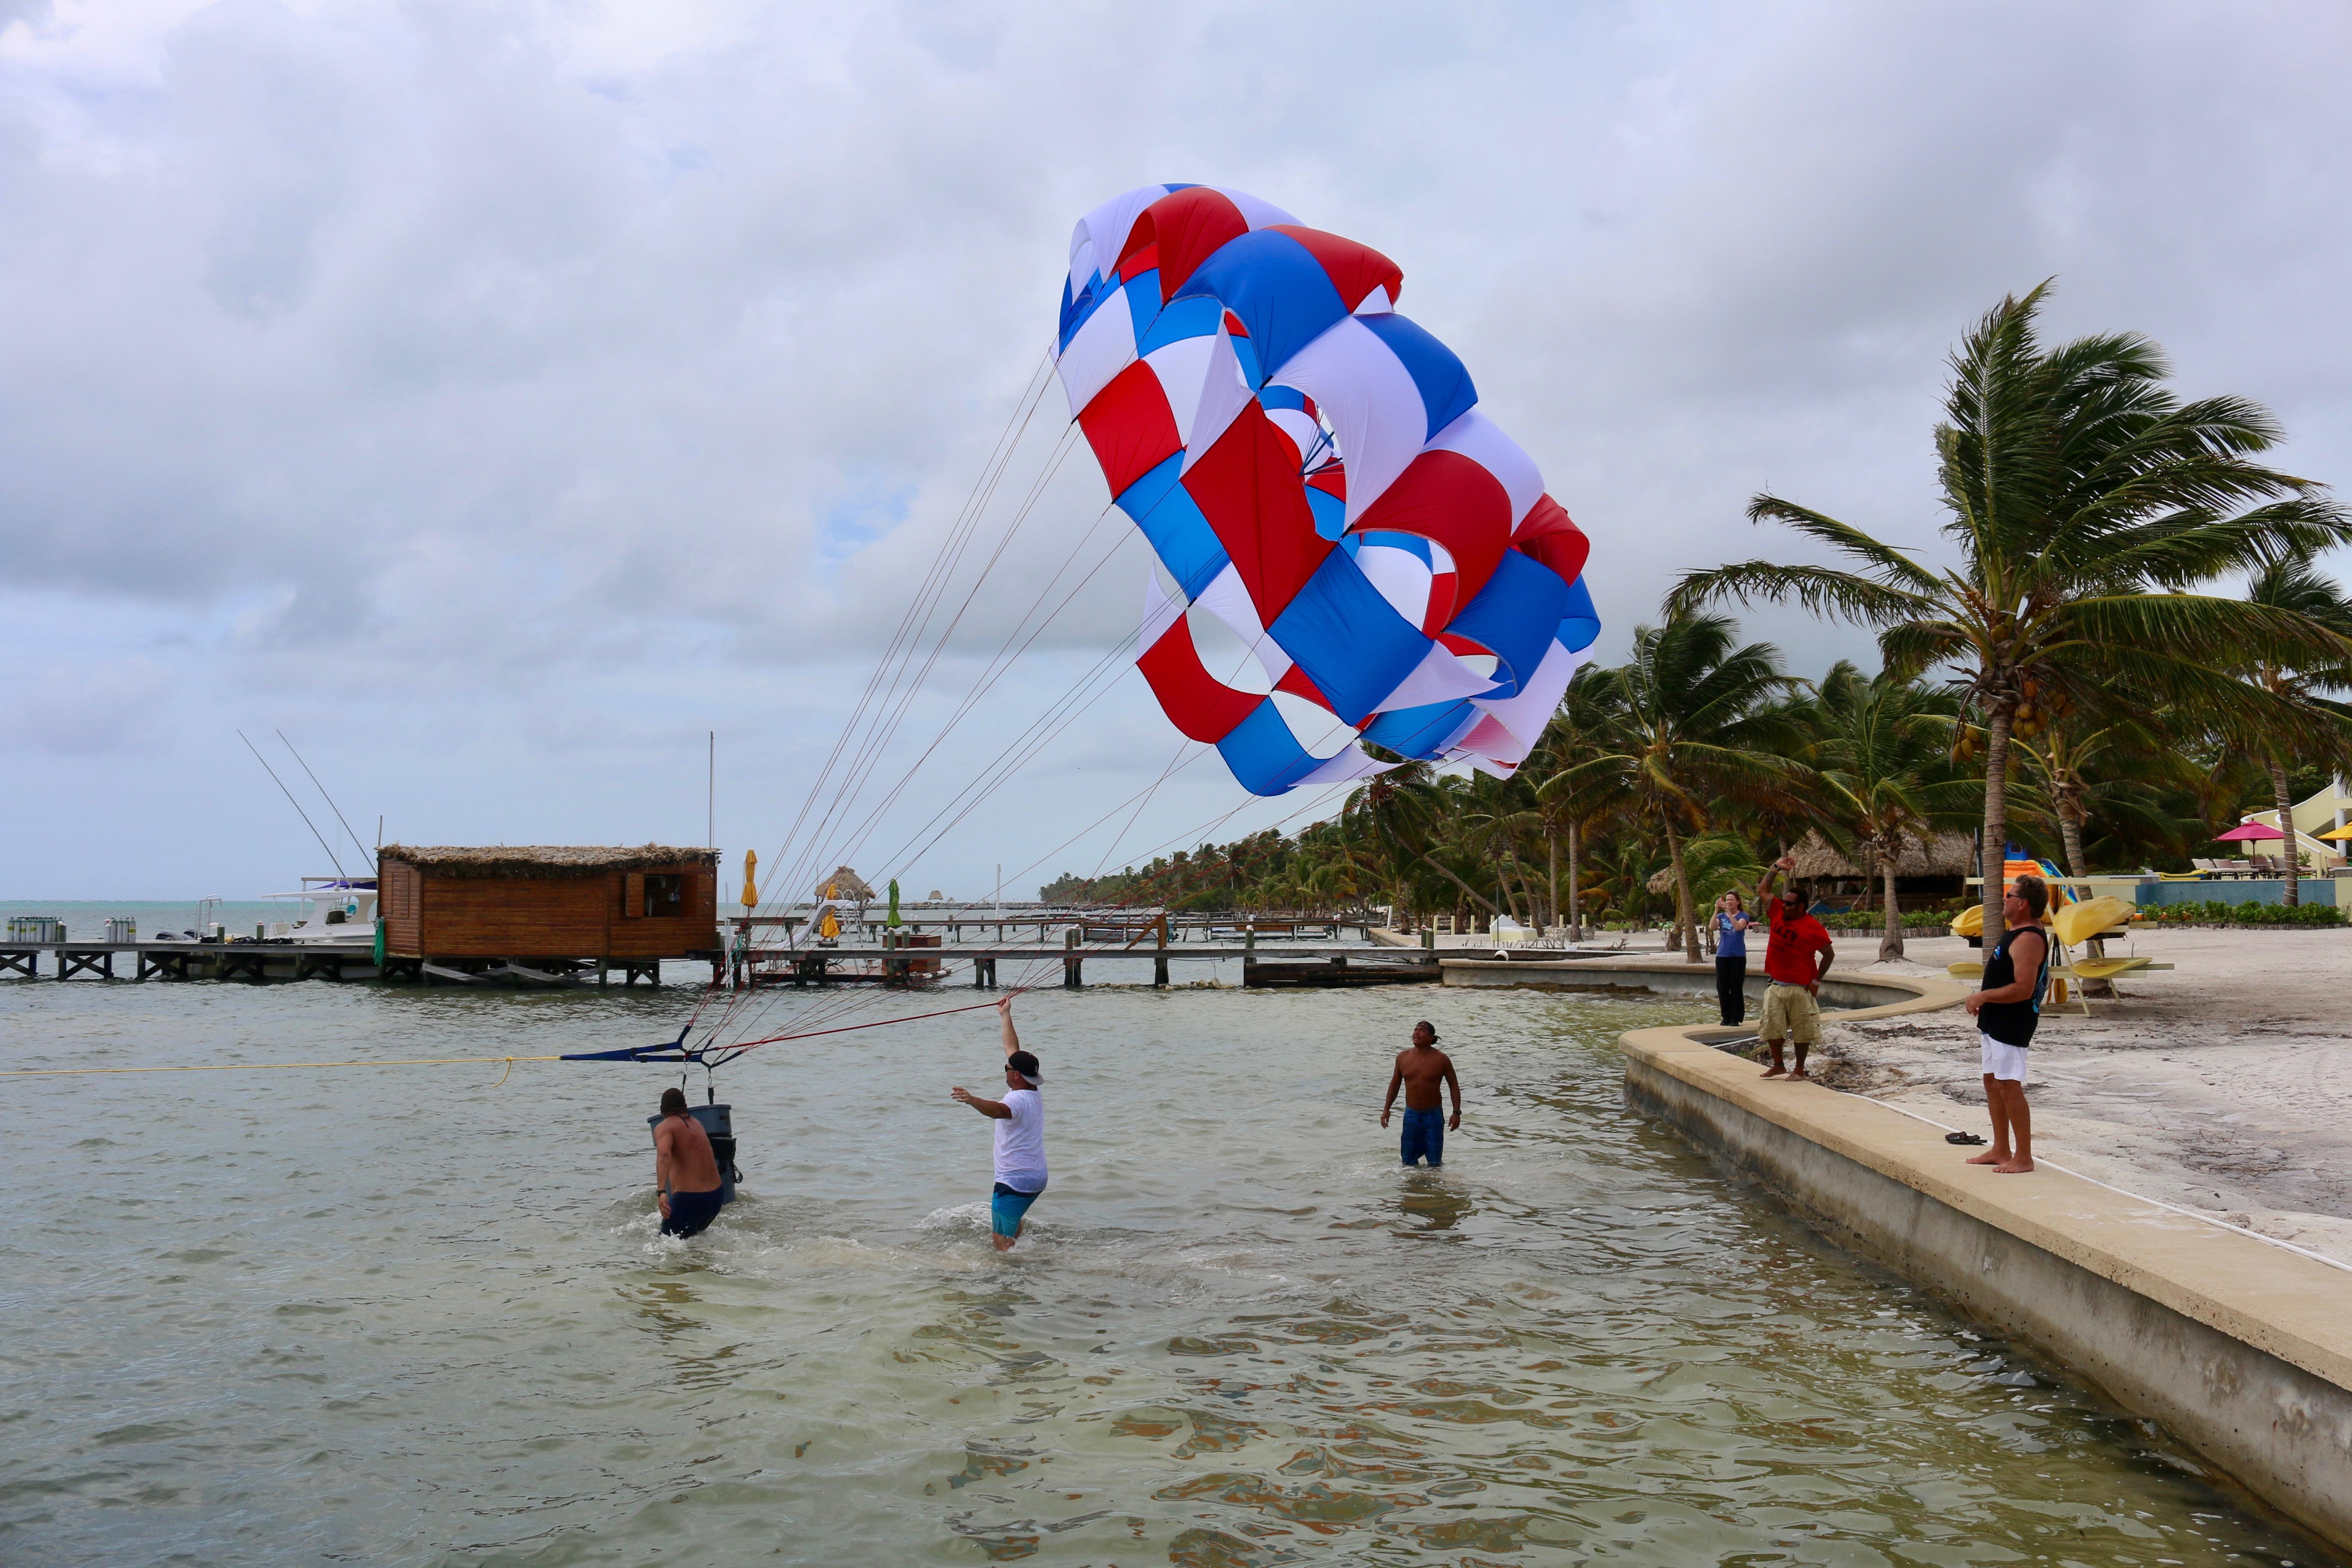 Guests Parasailing at Canary Cove